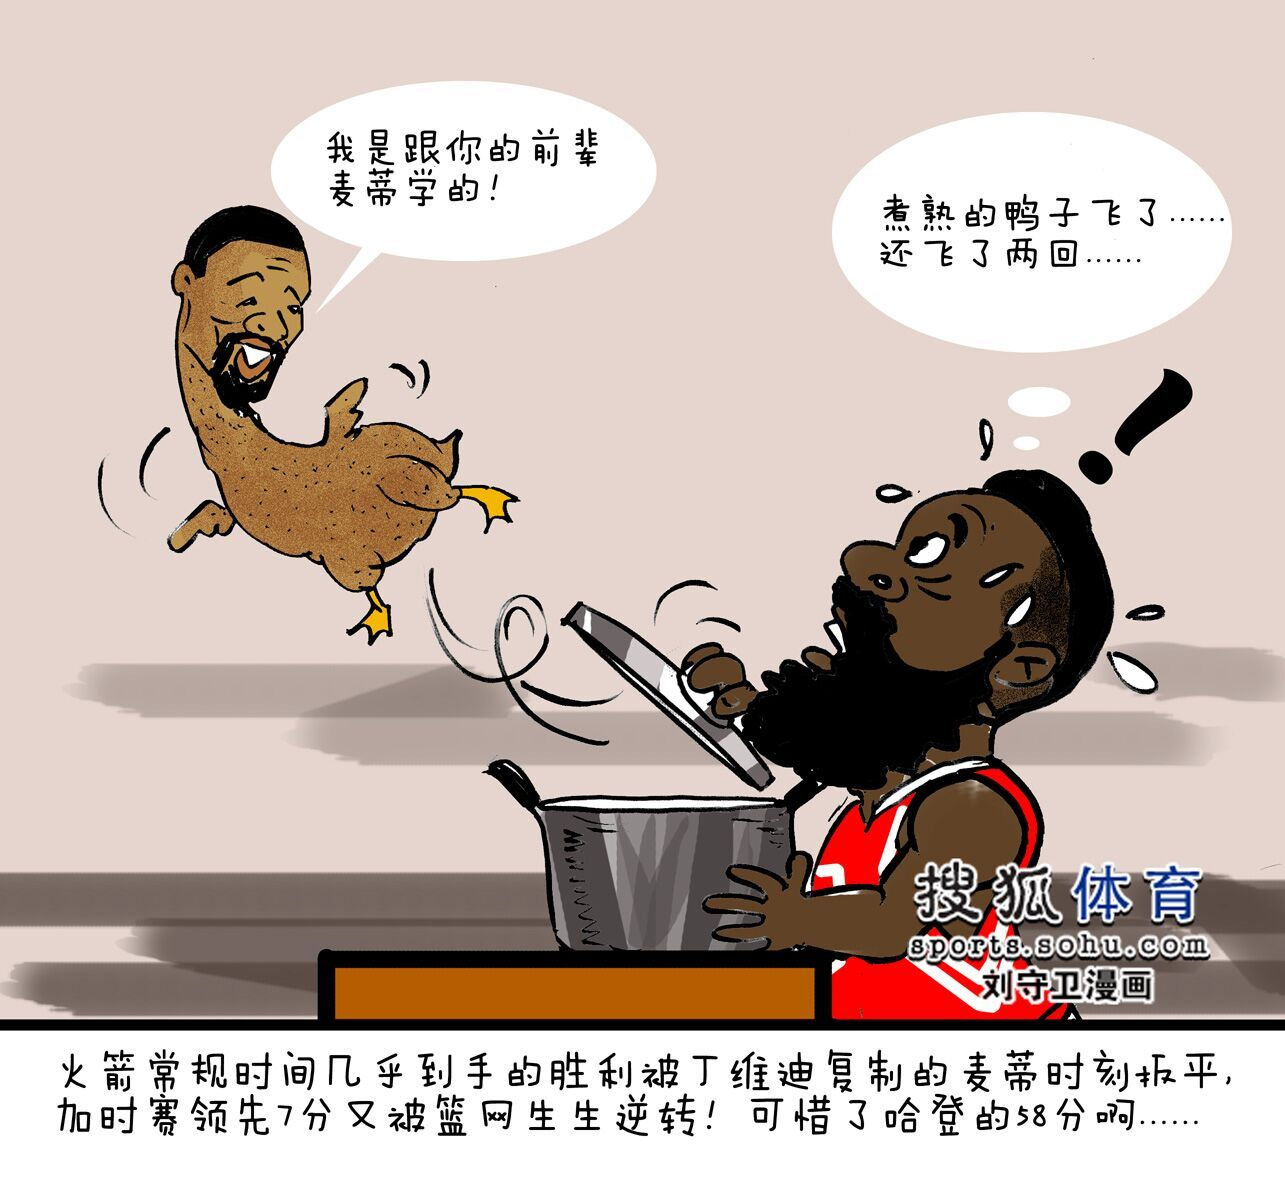 NBA漫画:丁维迪复制麦蒂时刻篮网加时逆转火箭